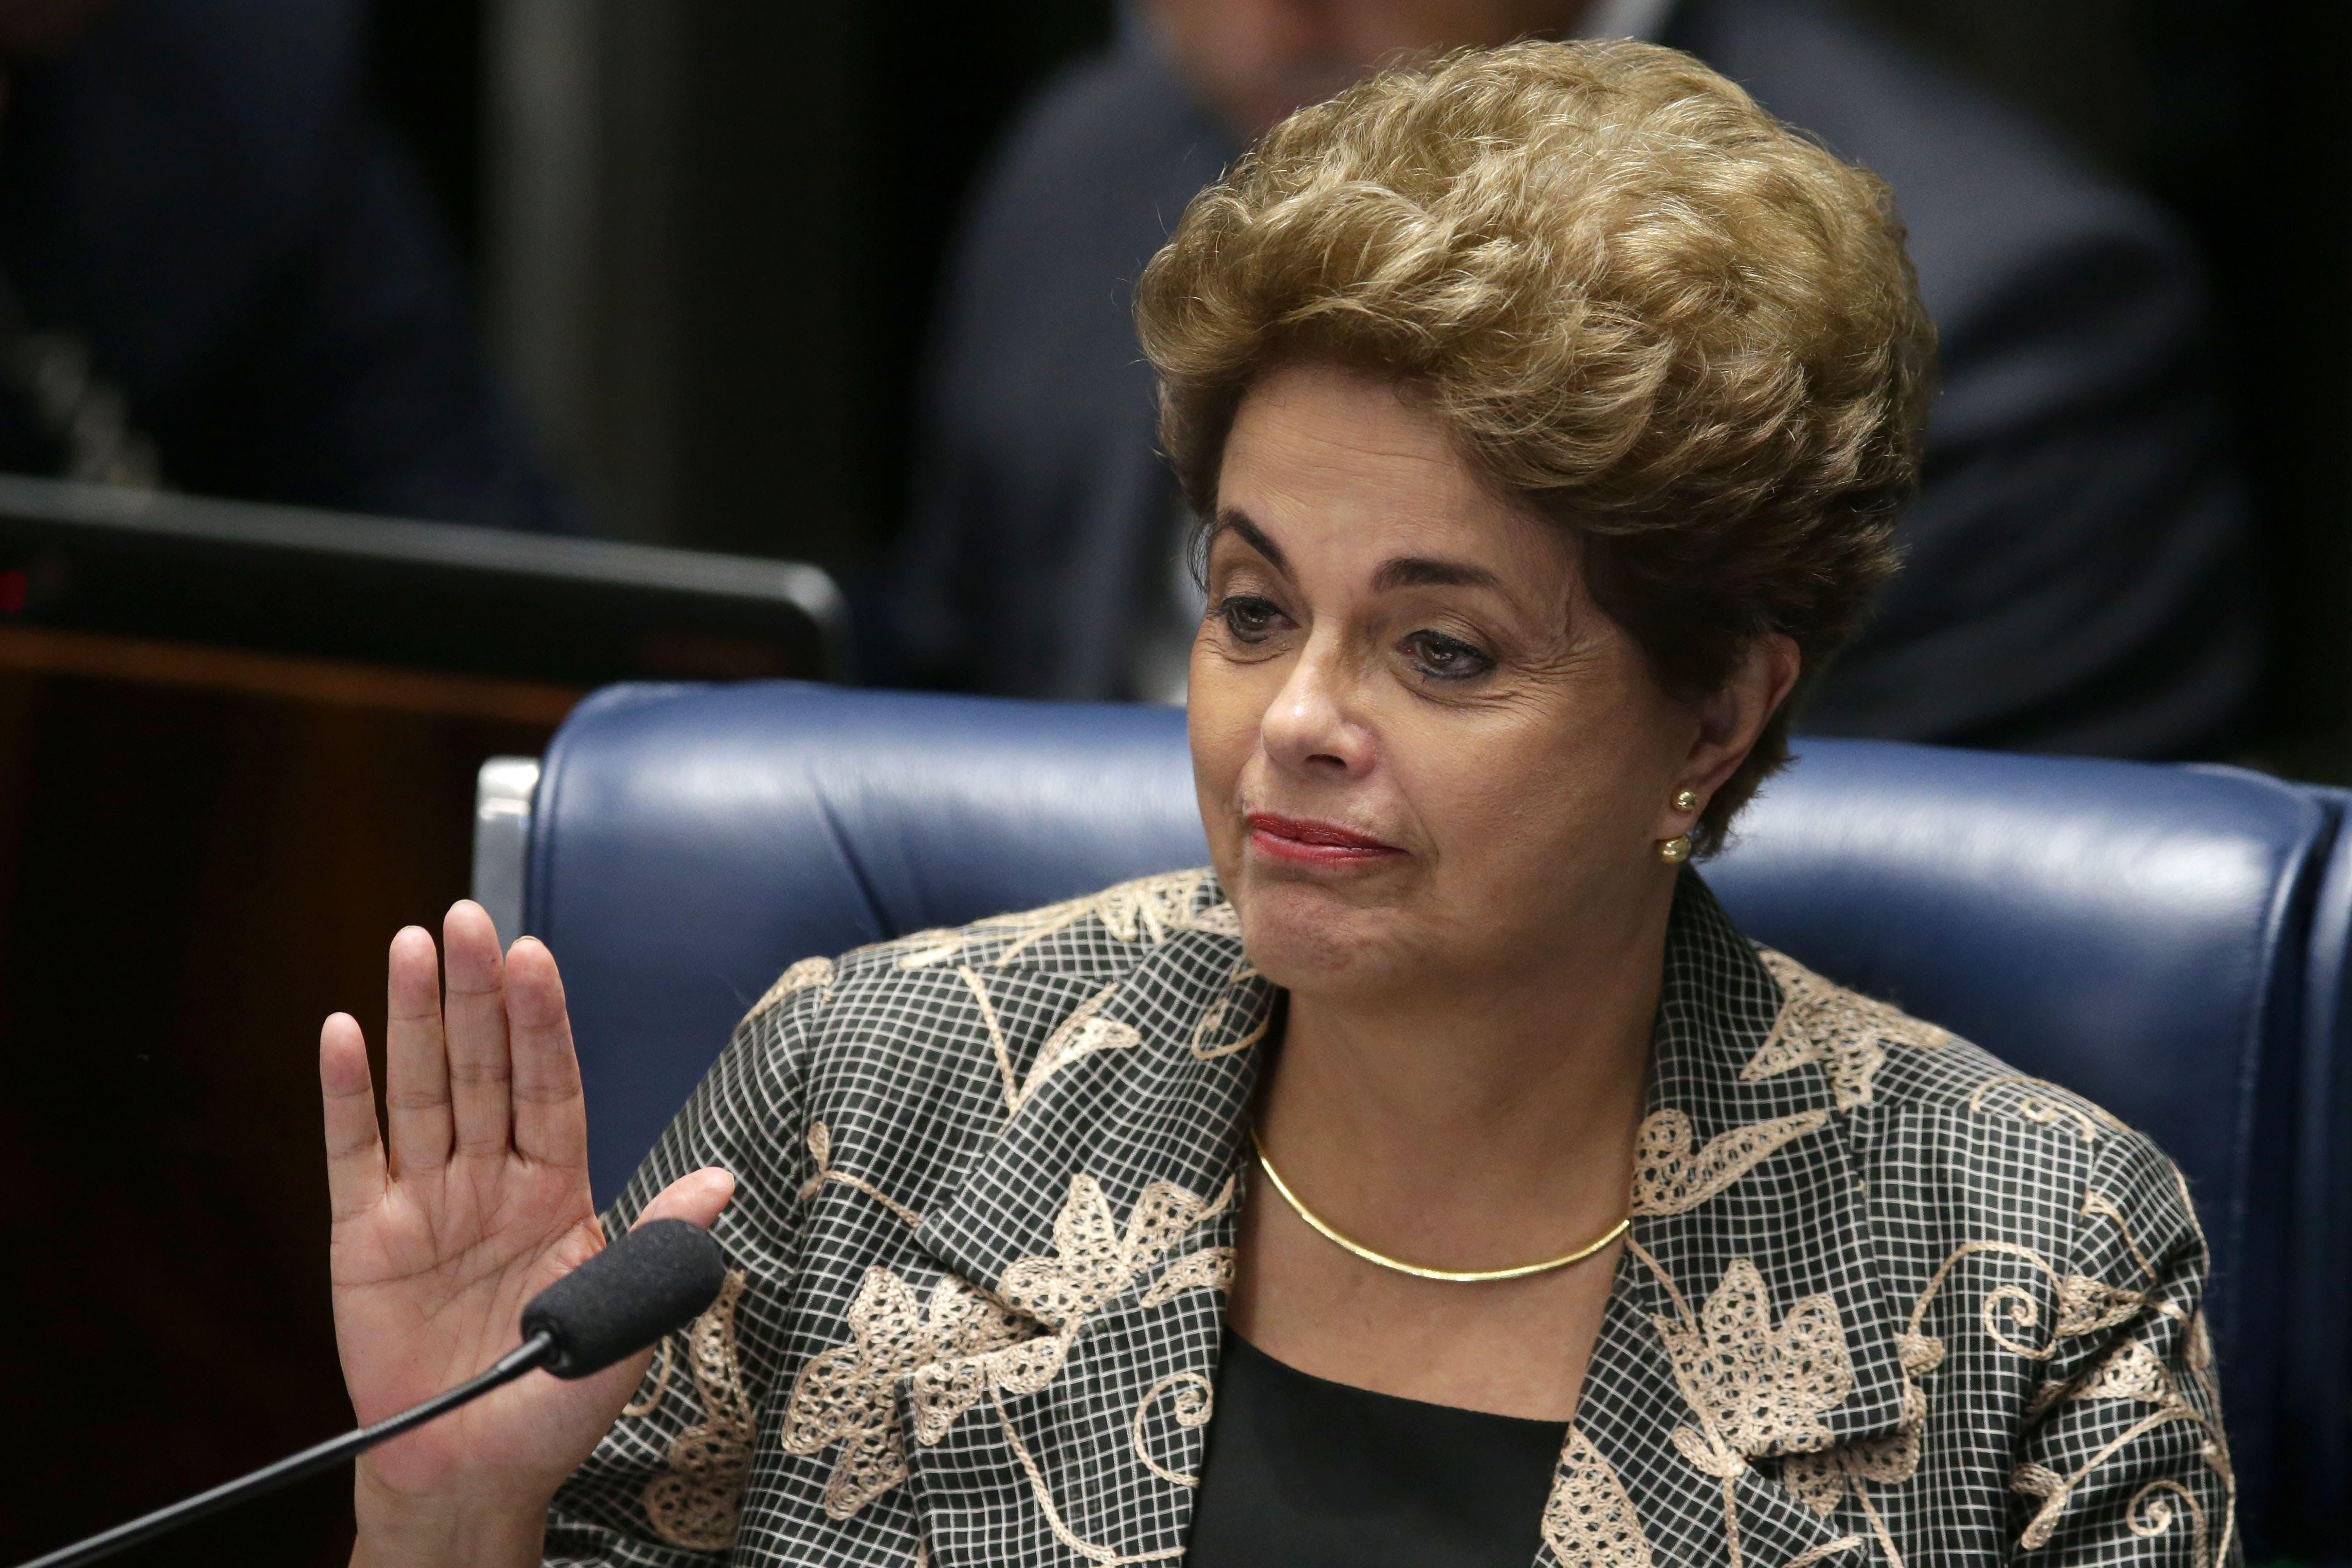 Caída de Rousseff no dio respiro a un Brasil ahogado por crisis y corrupción